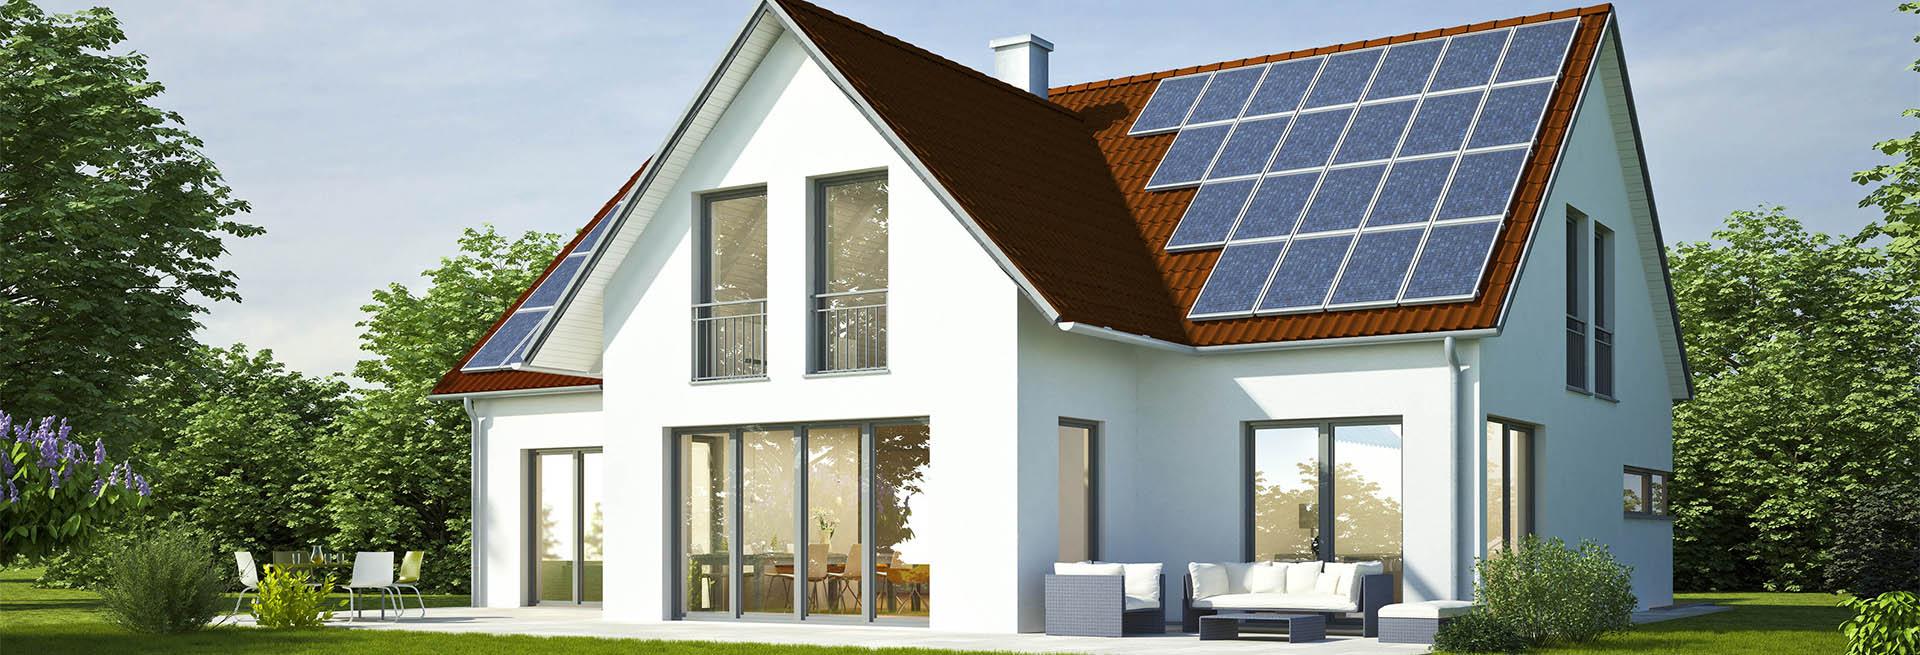 casa-energyitalyspa